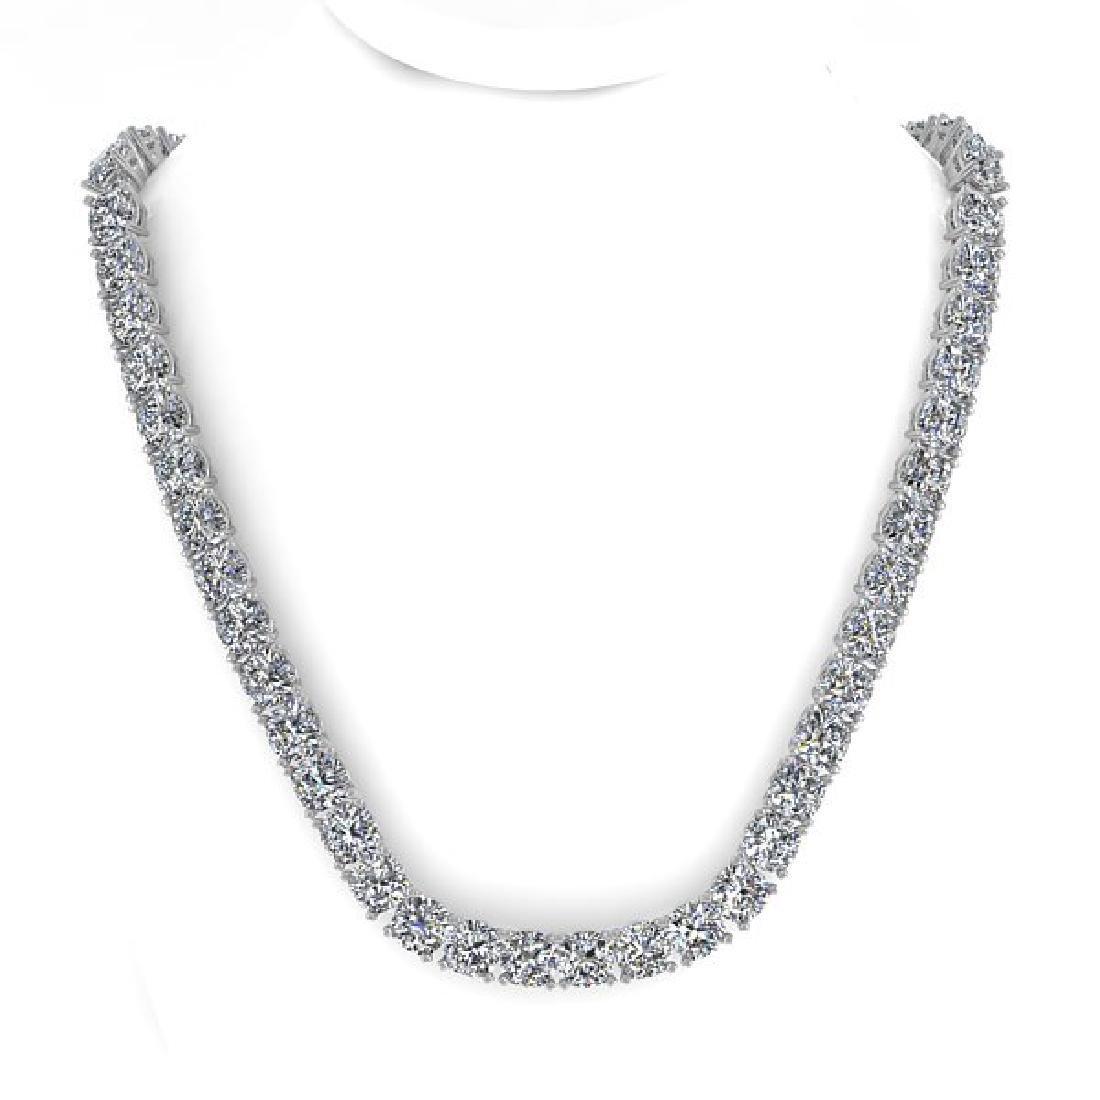 40 CTW Cushion Cut Certified SI Diamond Necklace 14K - 3